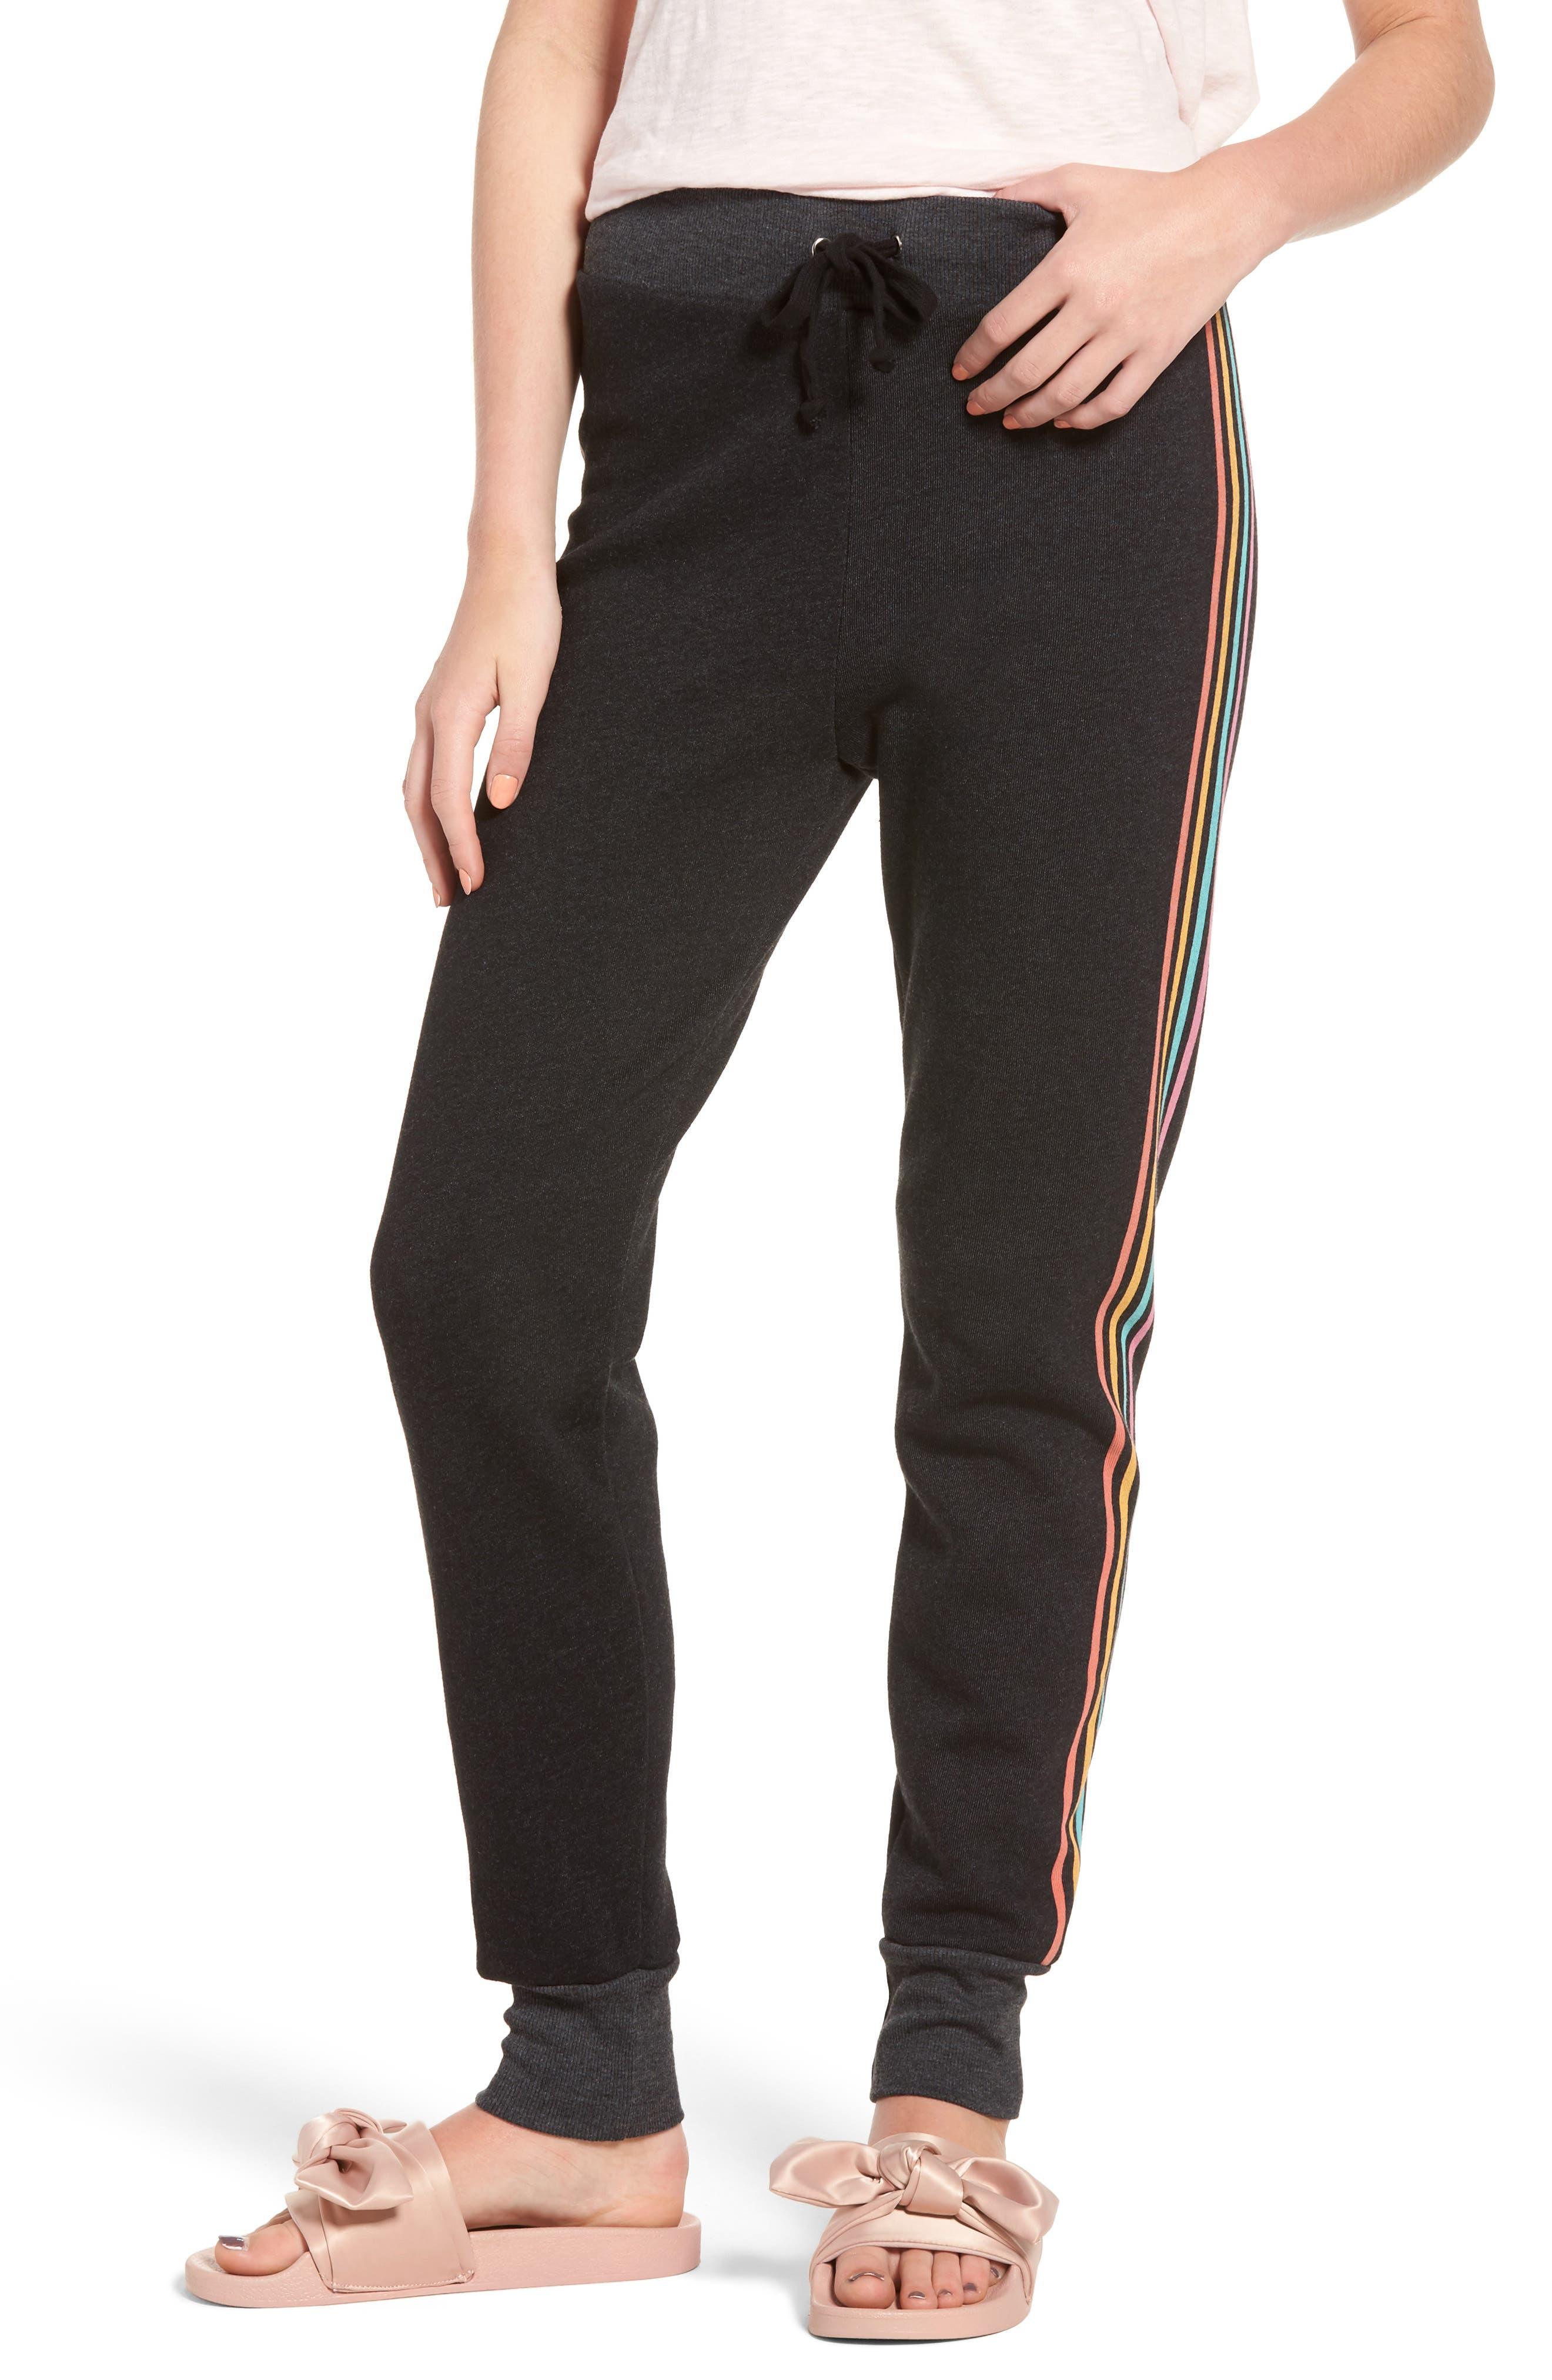 '80s Track Star Knox Sweatpants,                         Main,                         color, Heathered Black